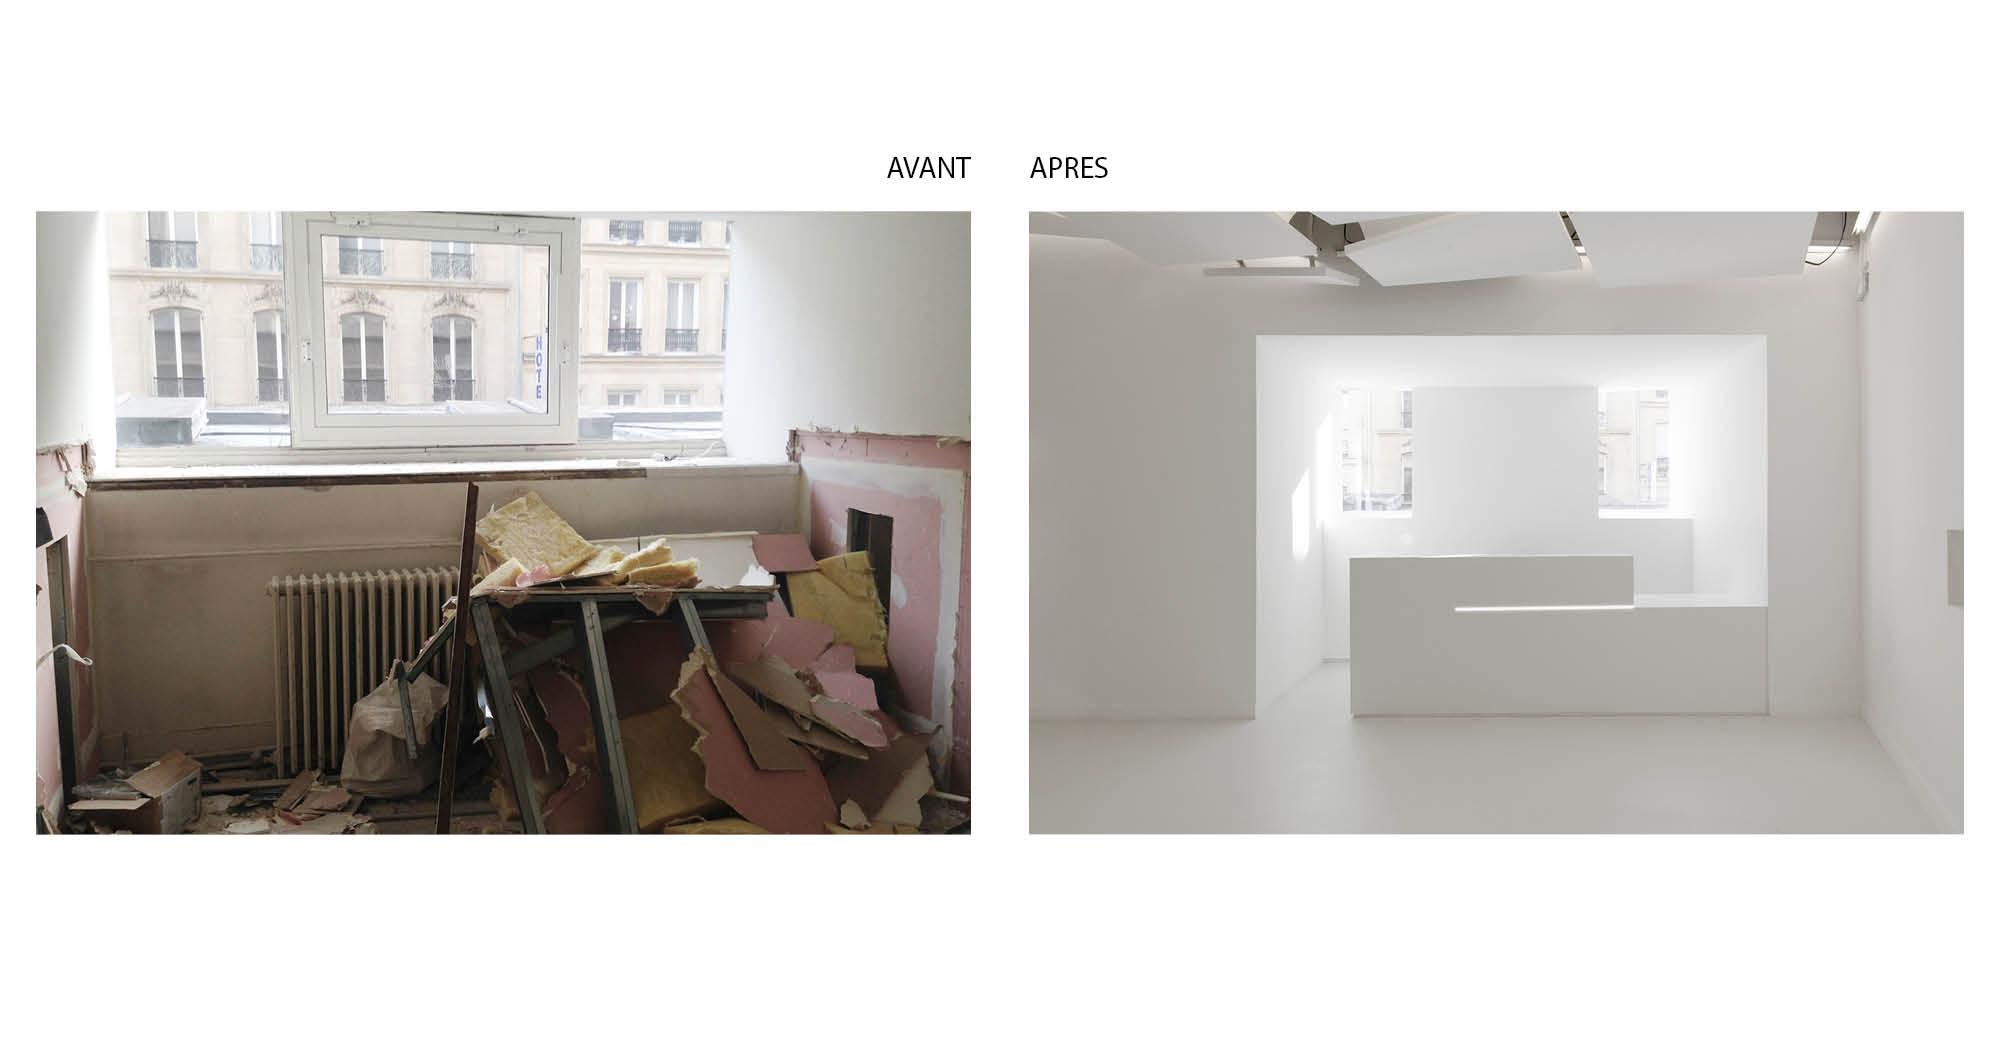 banque d accueil la galerie des galeries aba workshop. Black Bedroom Furniture Sets. Home Design Ideas